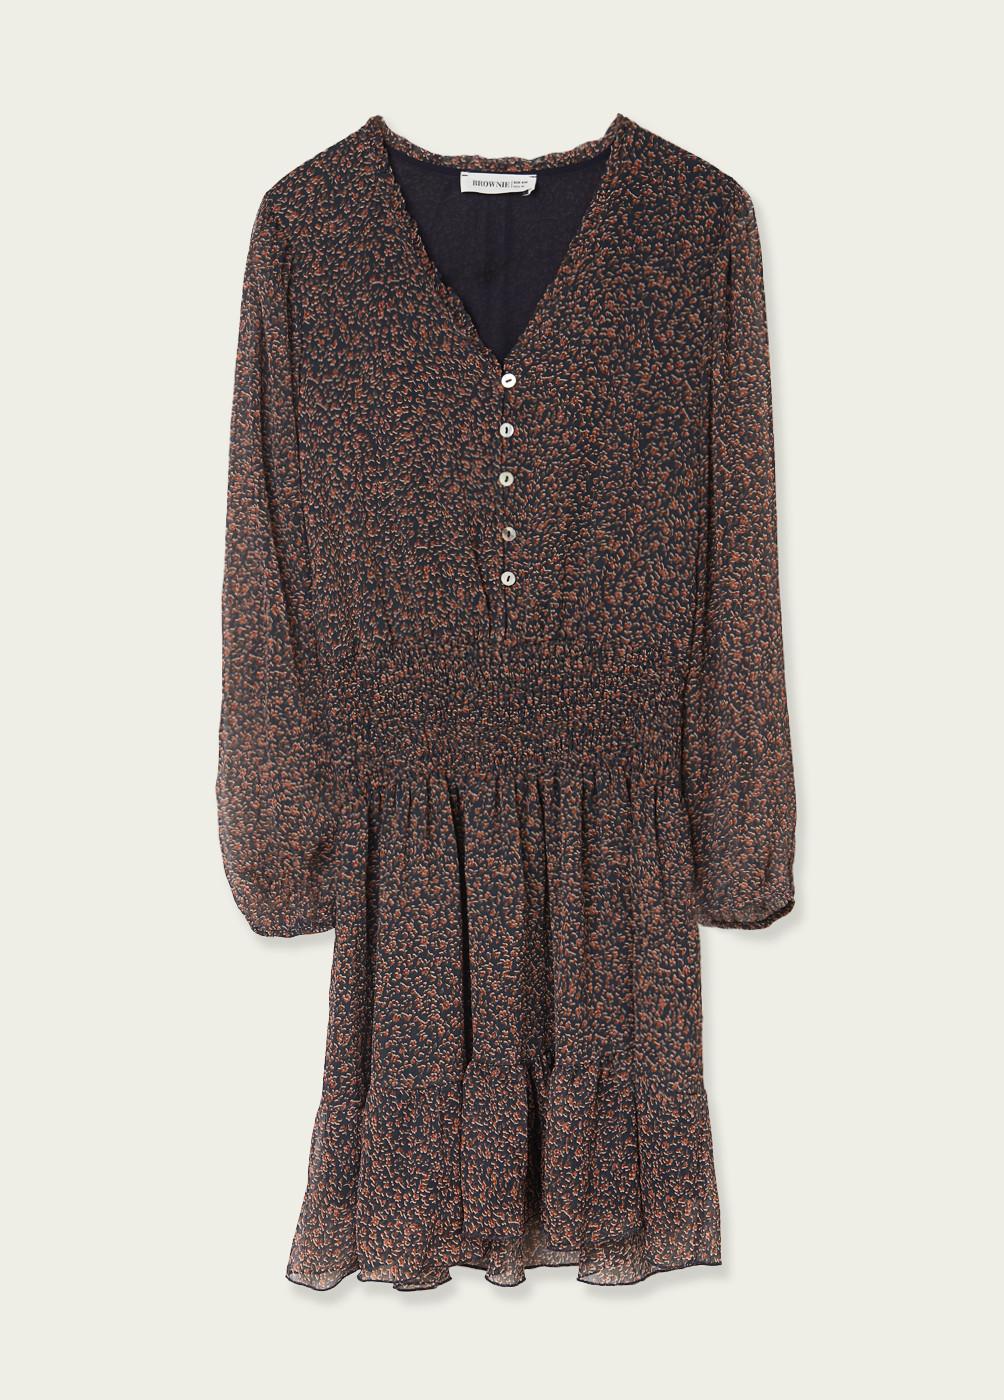 SELENA SHORT FLUID DRESS